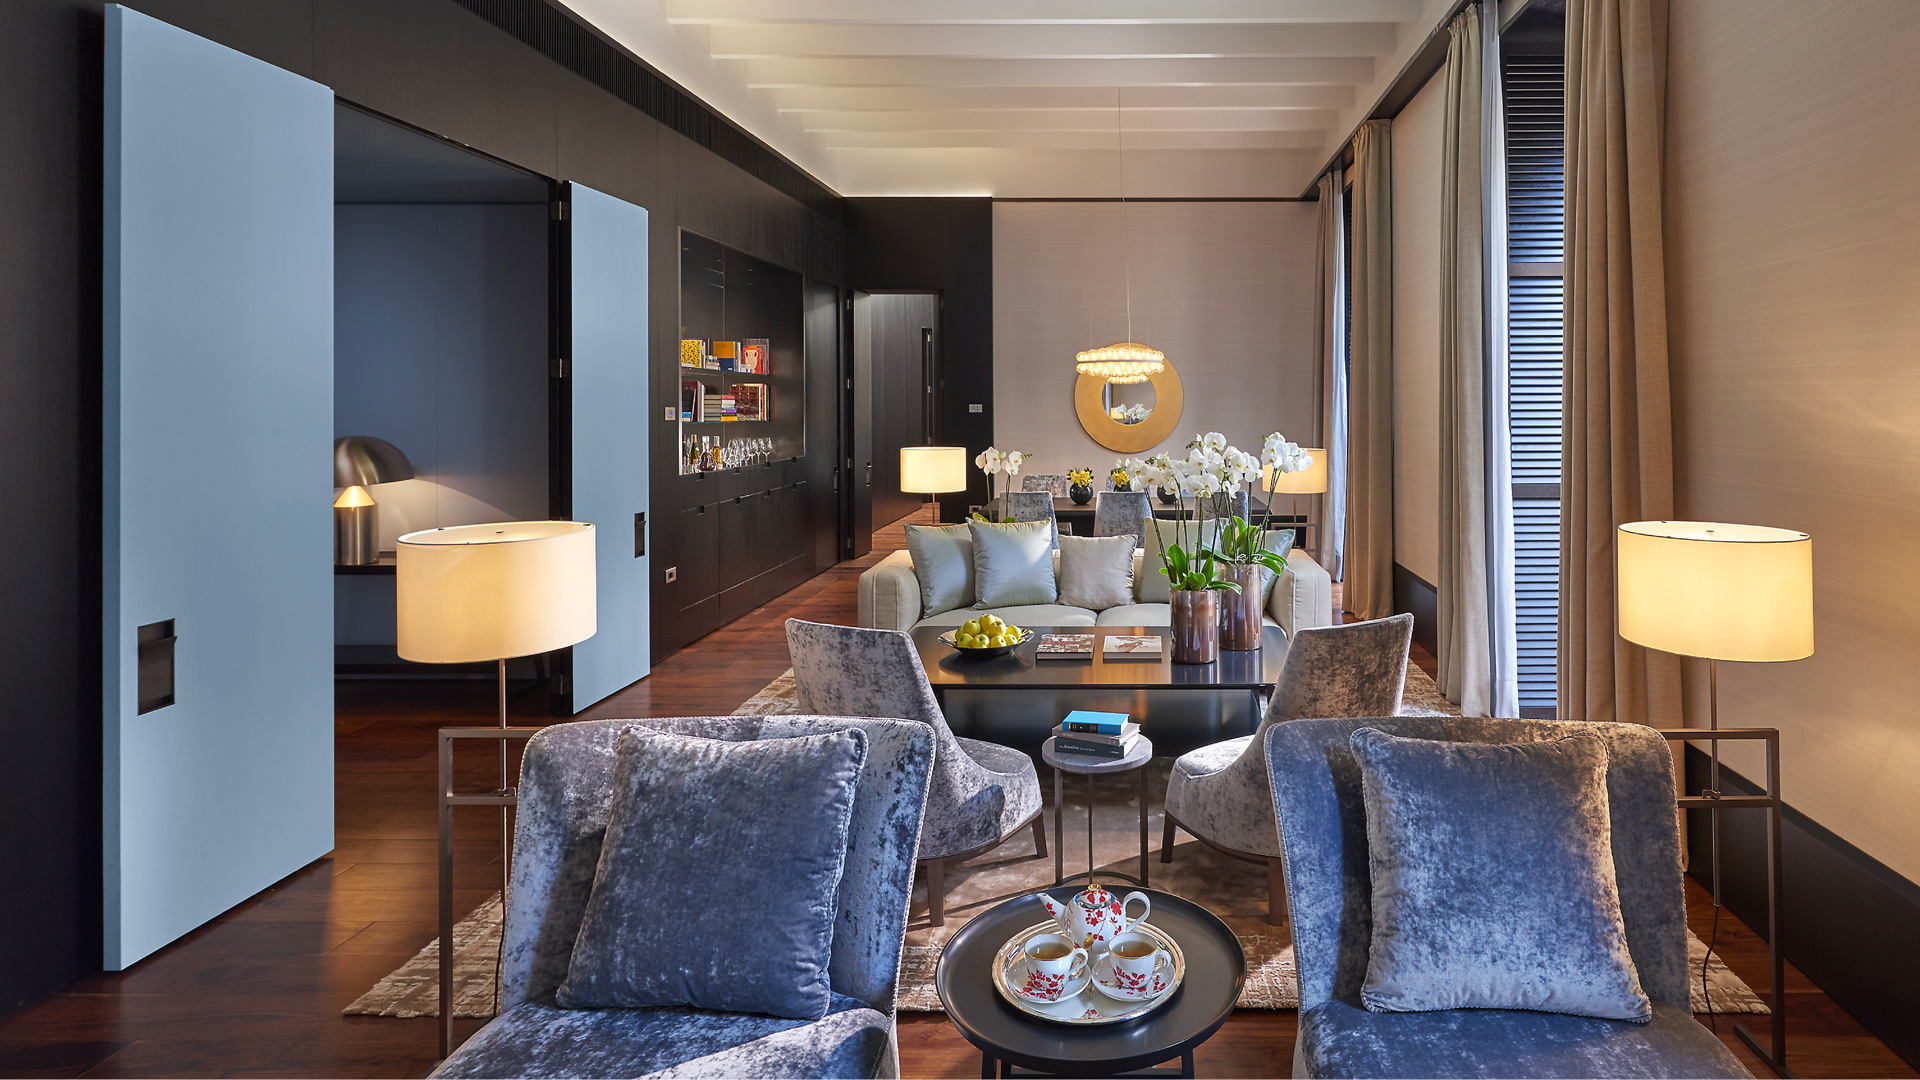 Poliform_contract_hospitality_MANDARIN_ORIENTAL_HOTEL_01_1920x1080px_cover